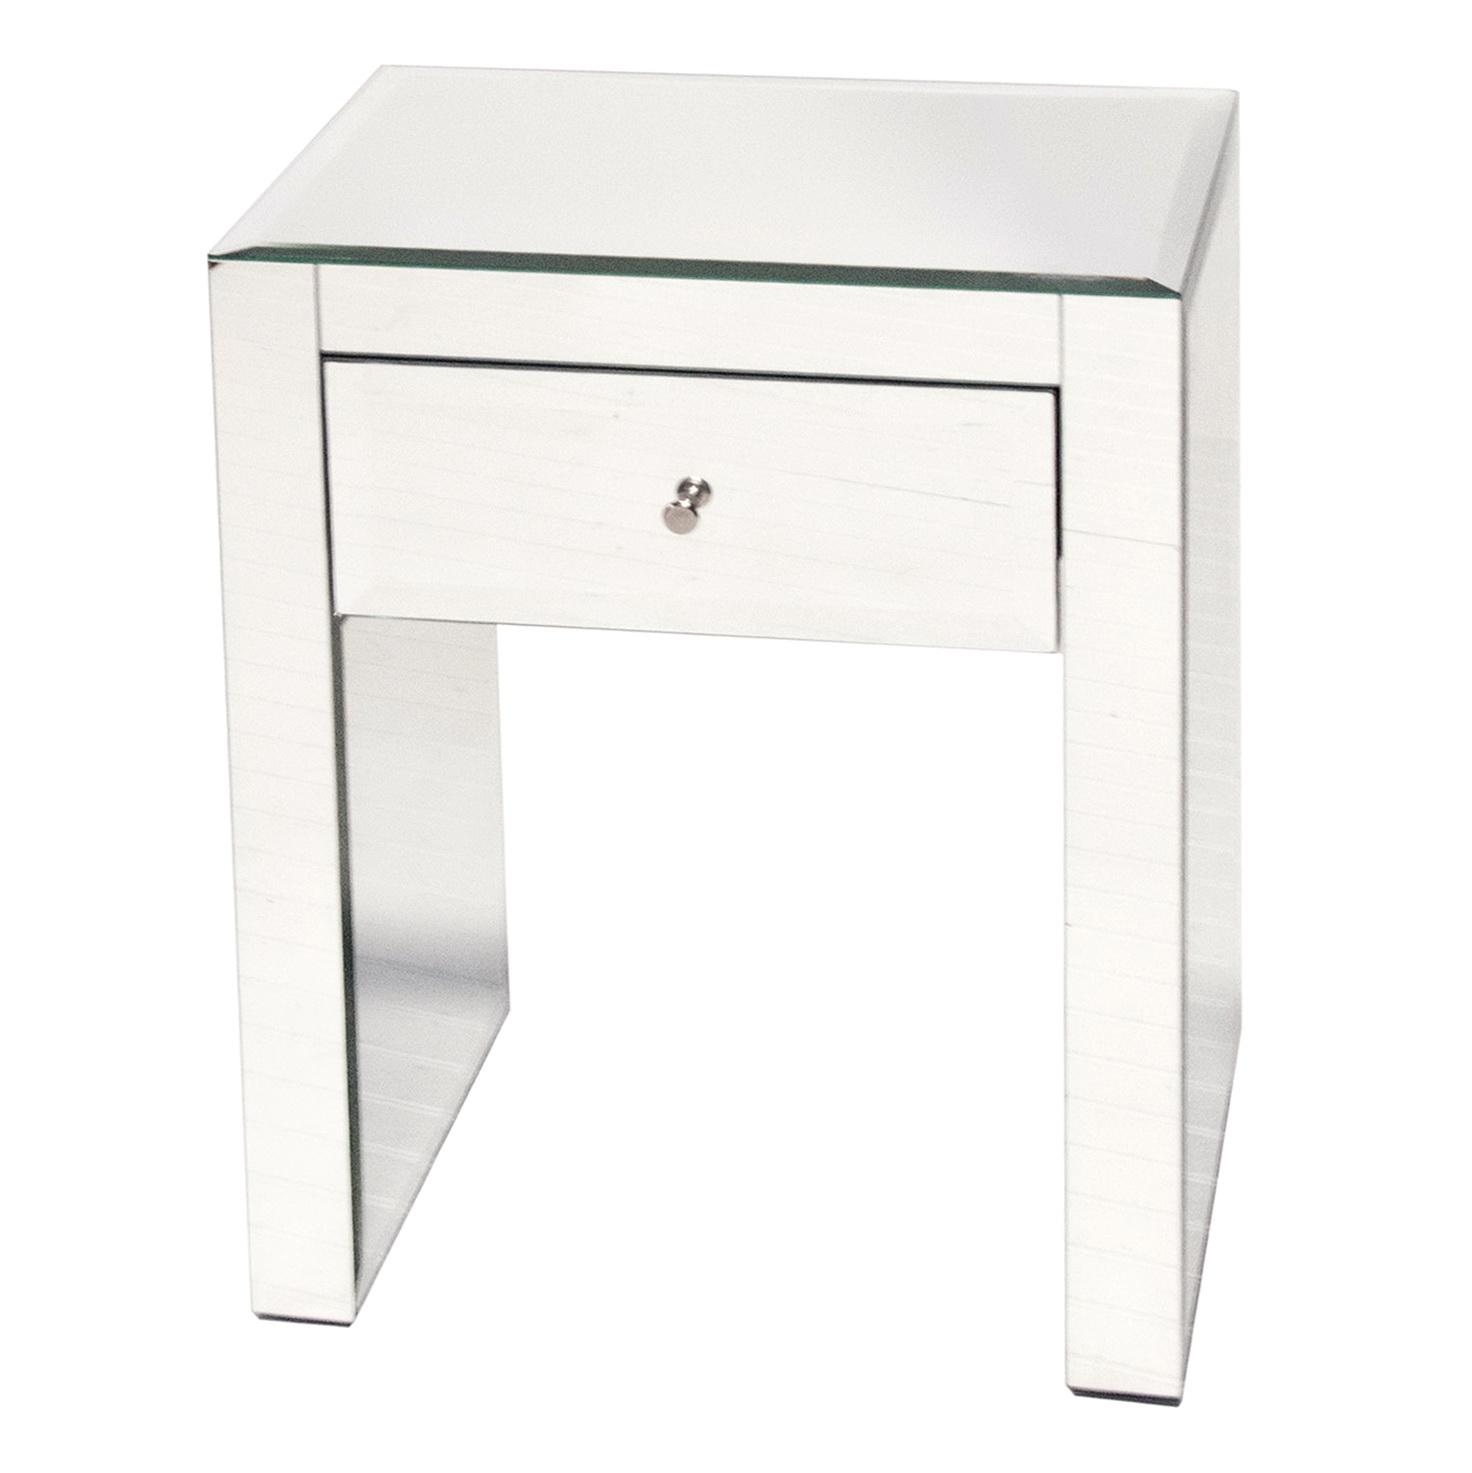 Cheap Mirrored Furniture Australia